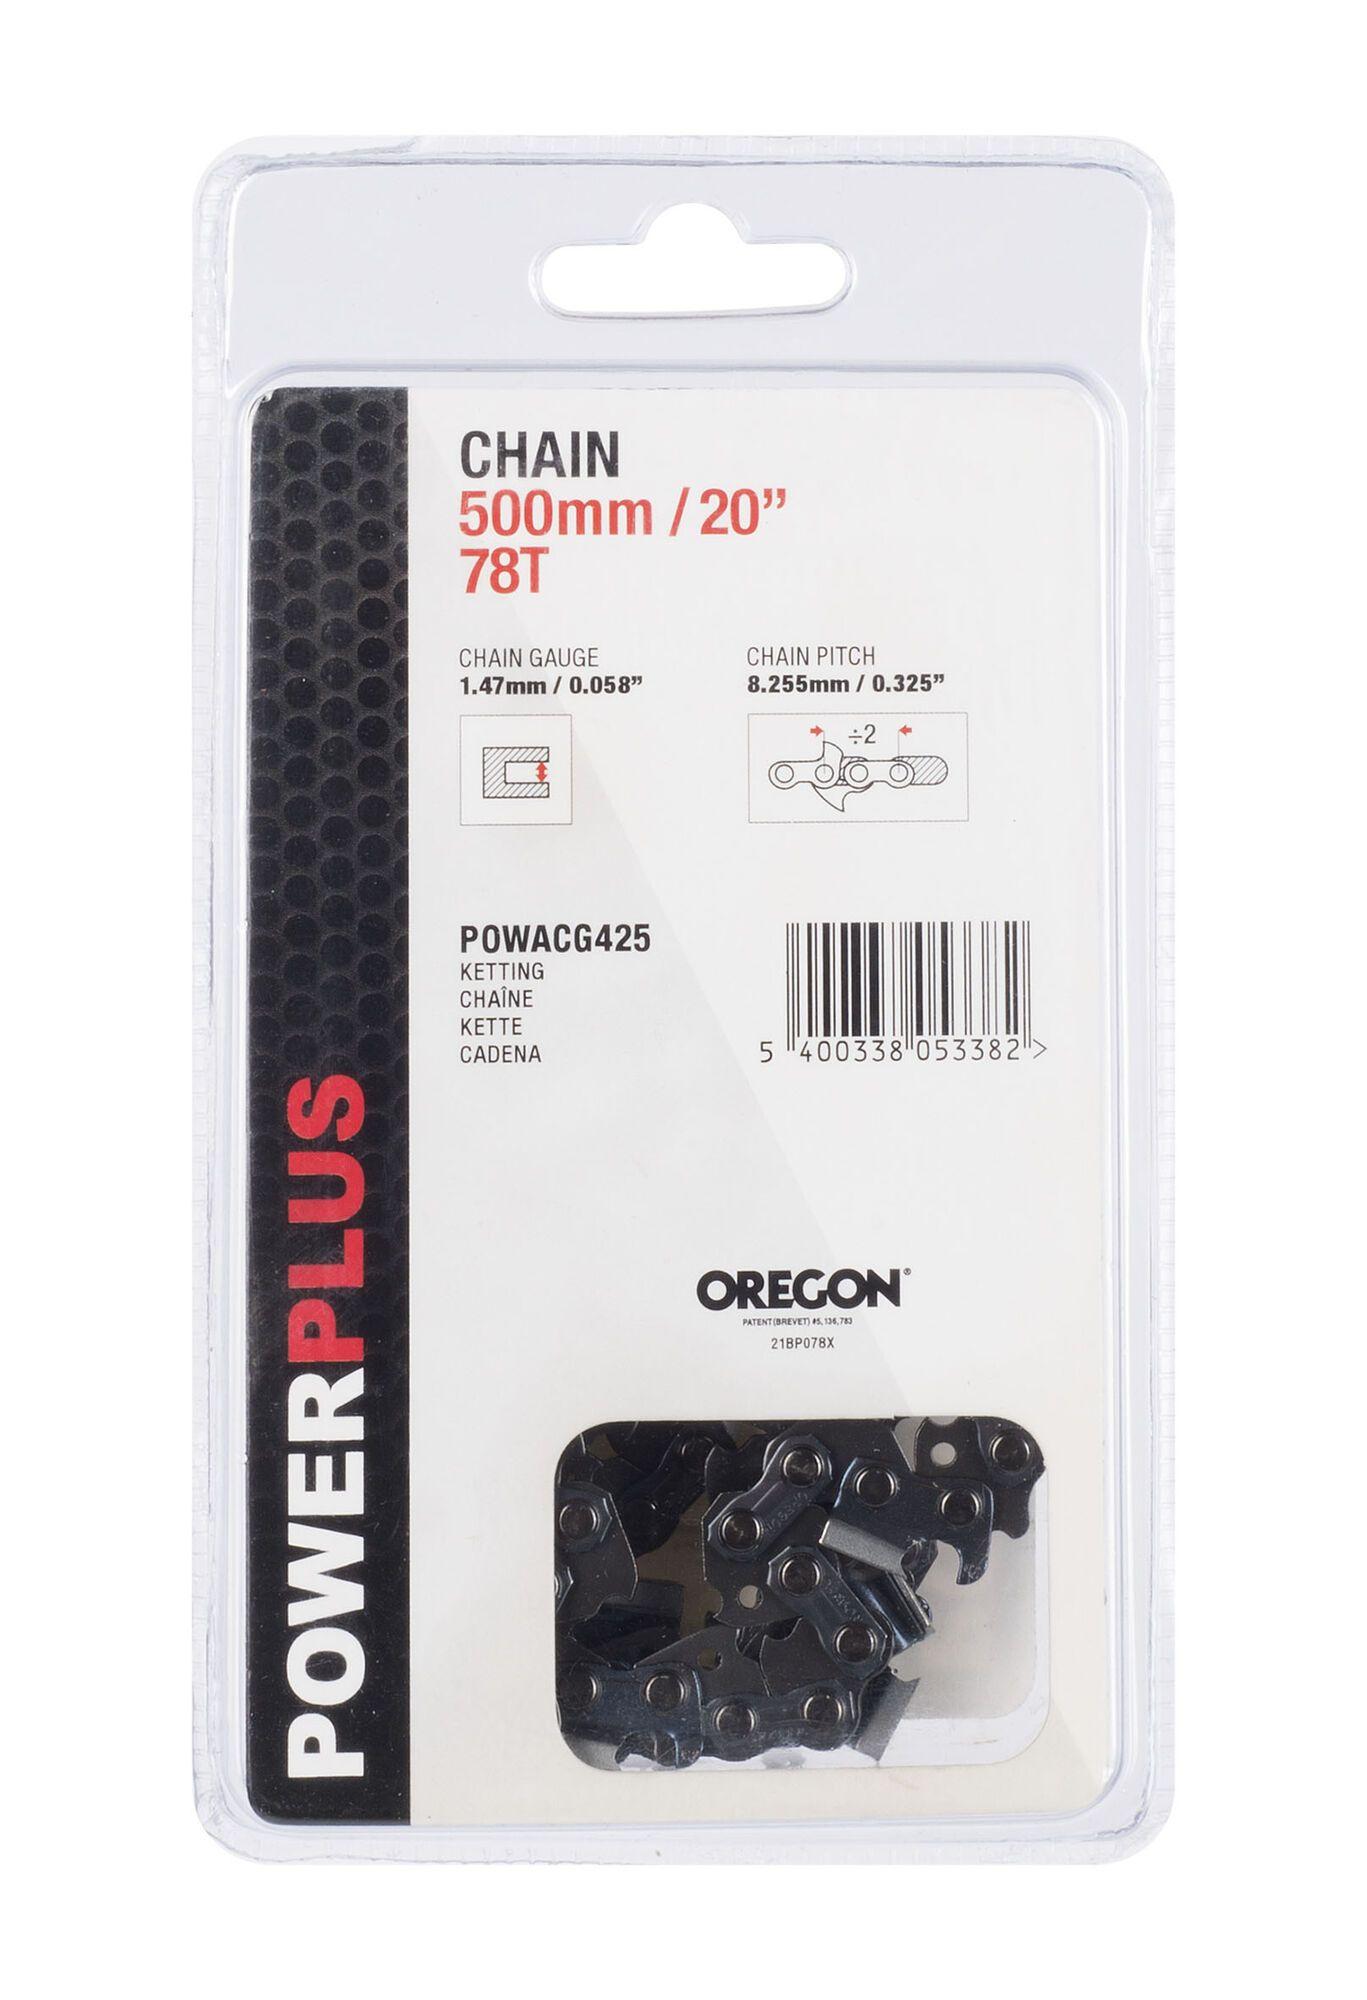 "Powerplus POWACG425 20"" Oregon ketting voor kettingzaag 580 mm 78 tanden"